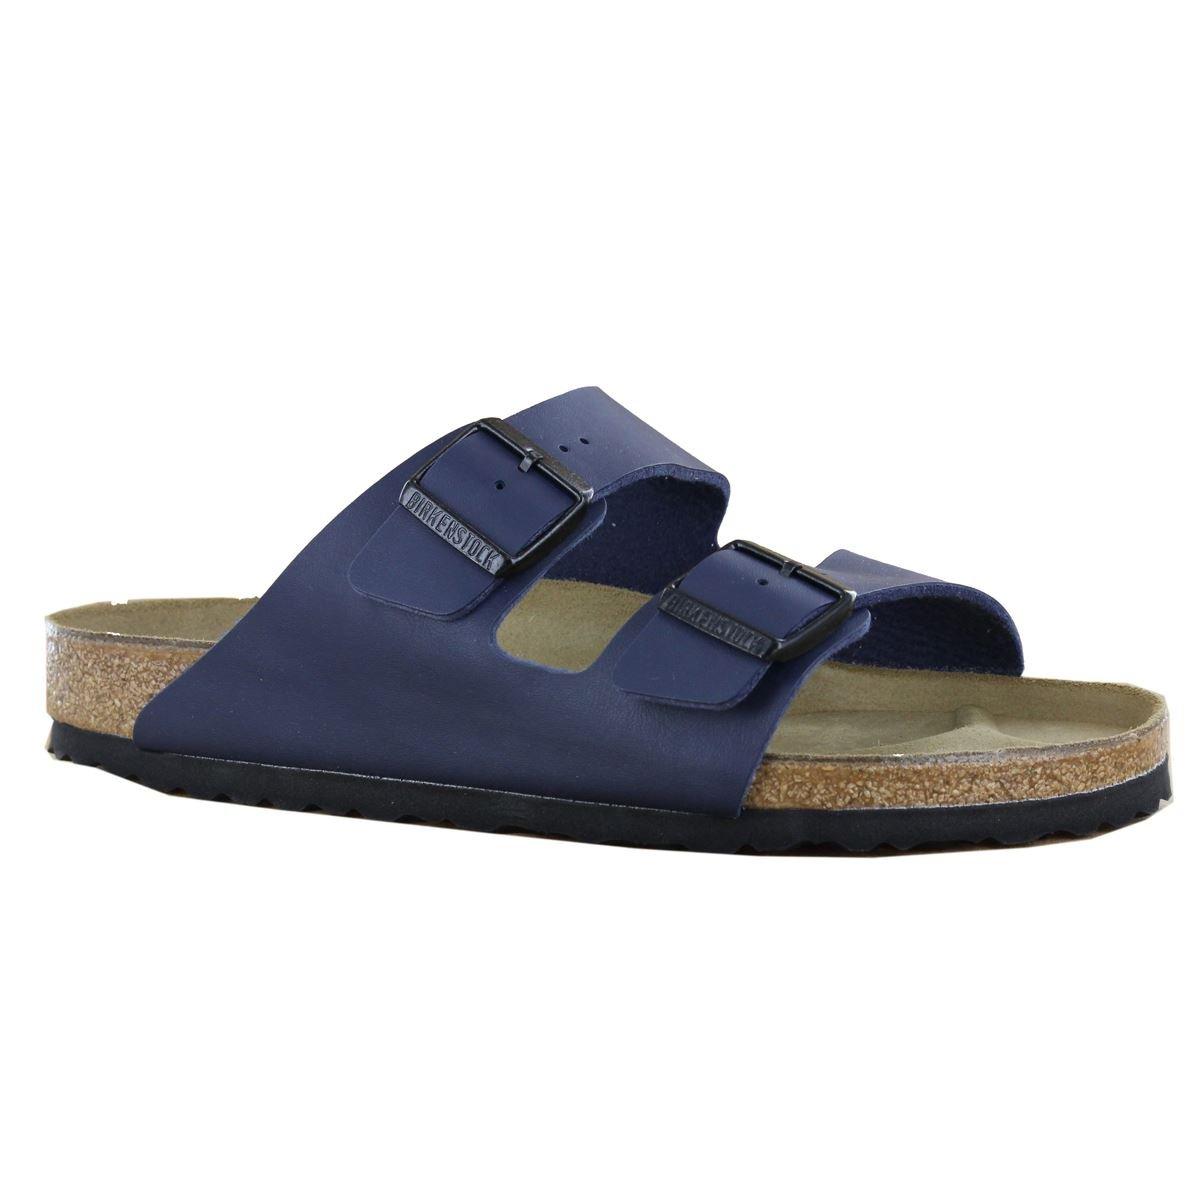 Birkenstock Arizona Blue Mens Sandals Size 45 EU